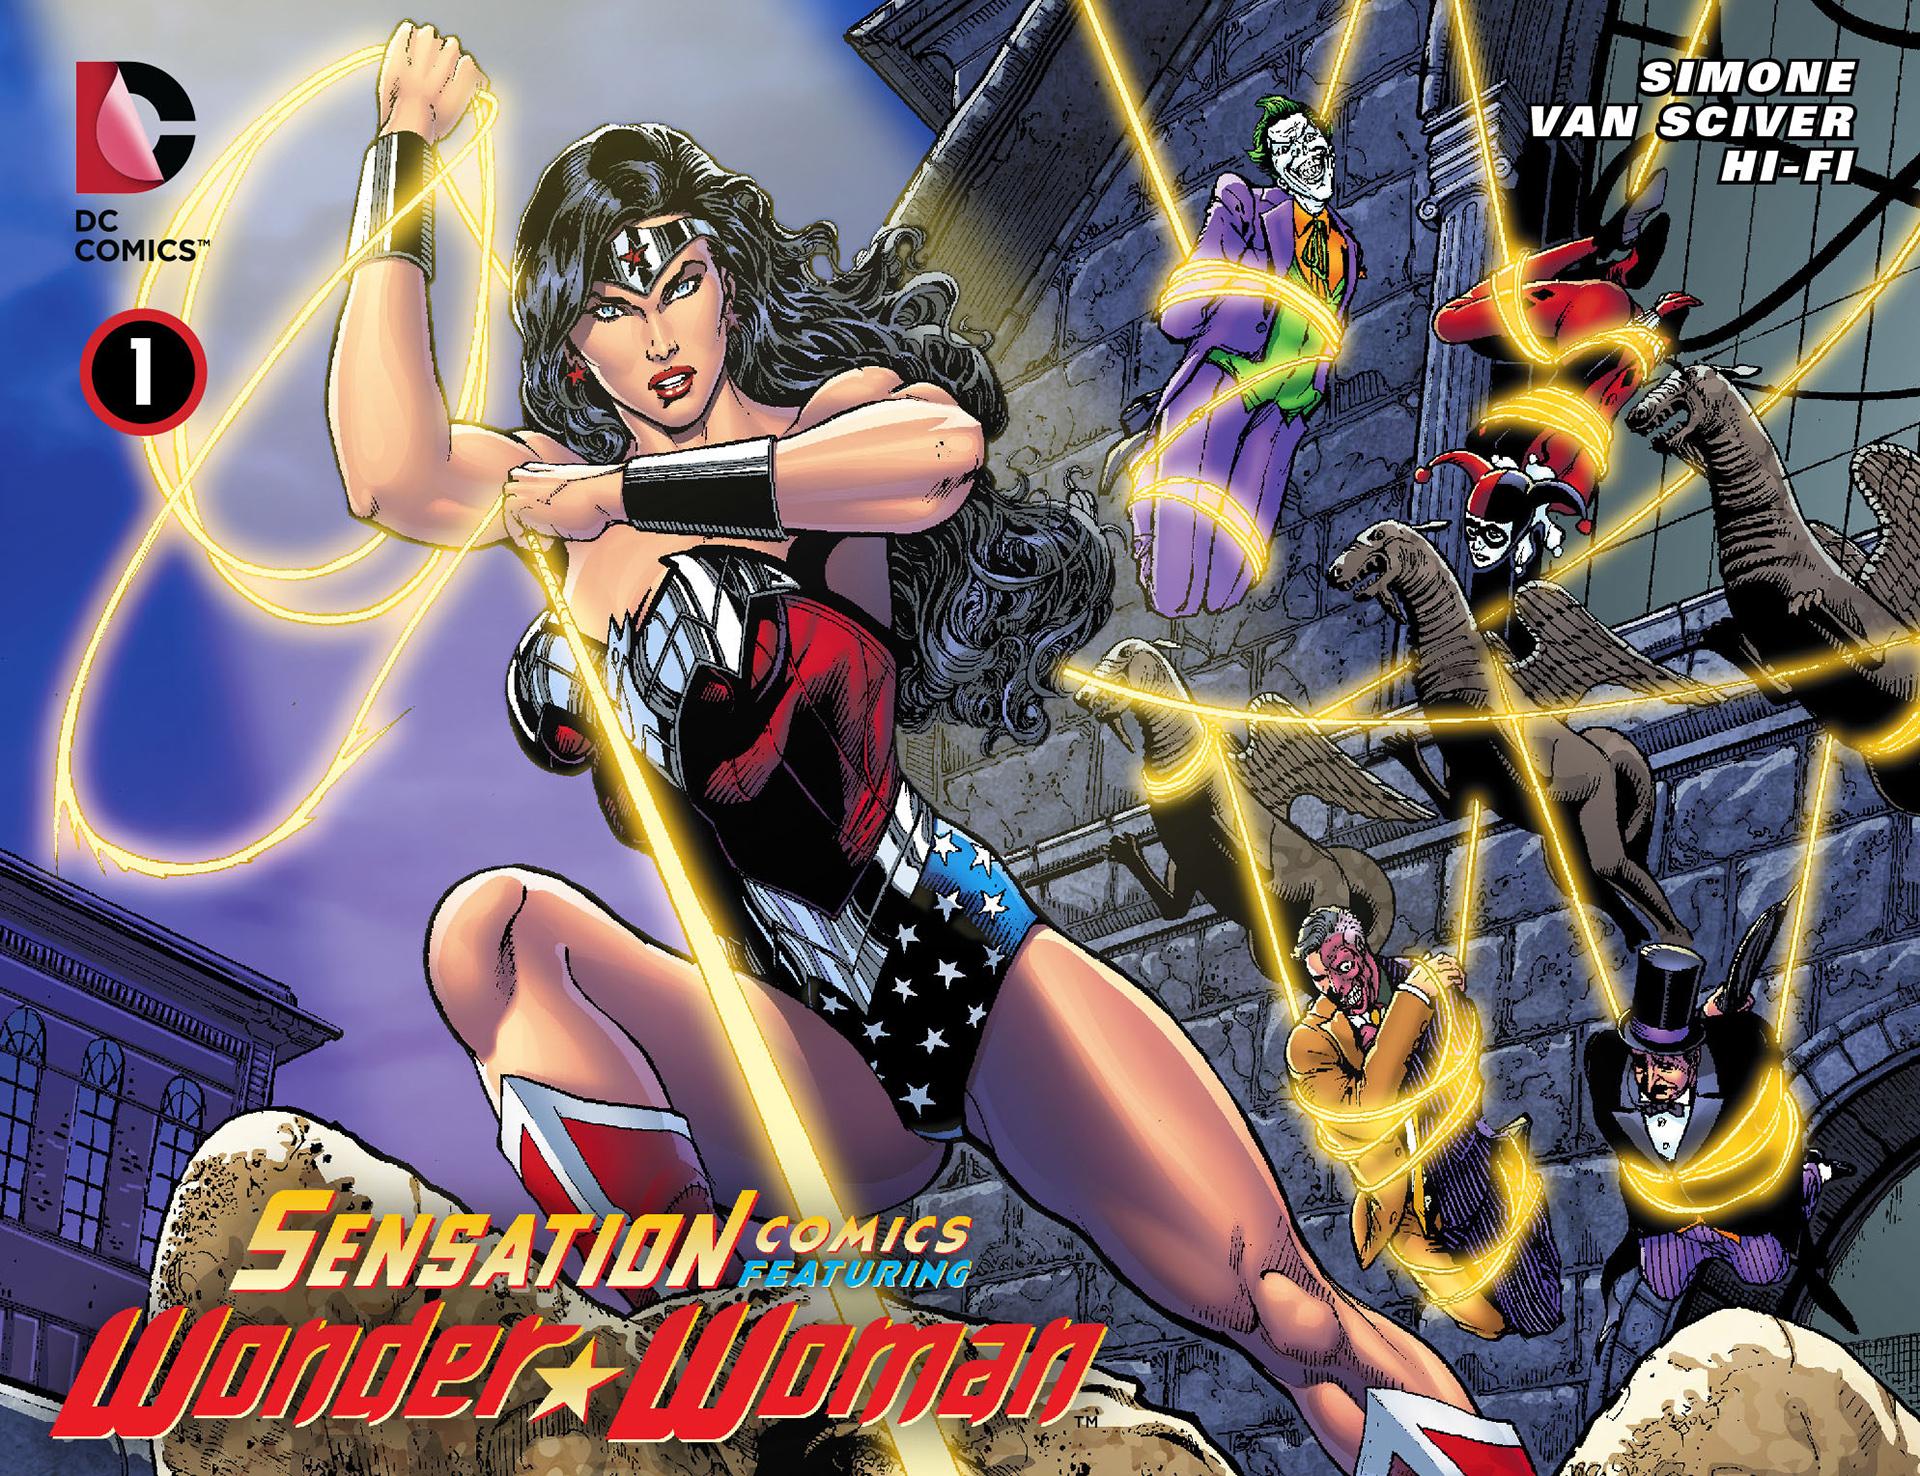 Read online Sensation Comics Featuring Wonder Woman comic -  Issue #1 - 1